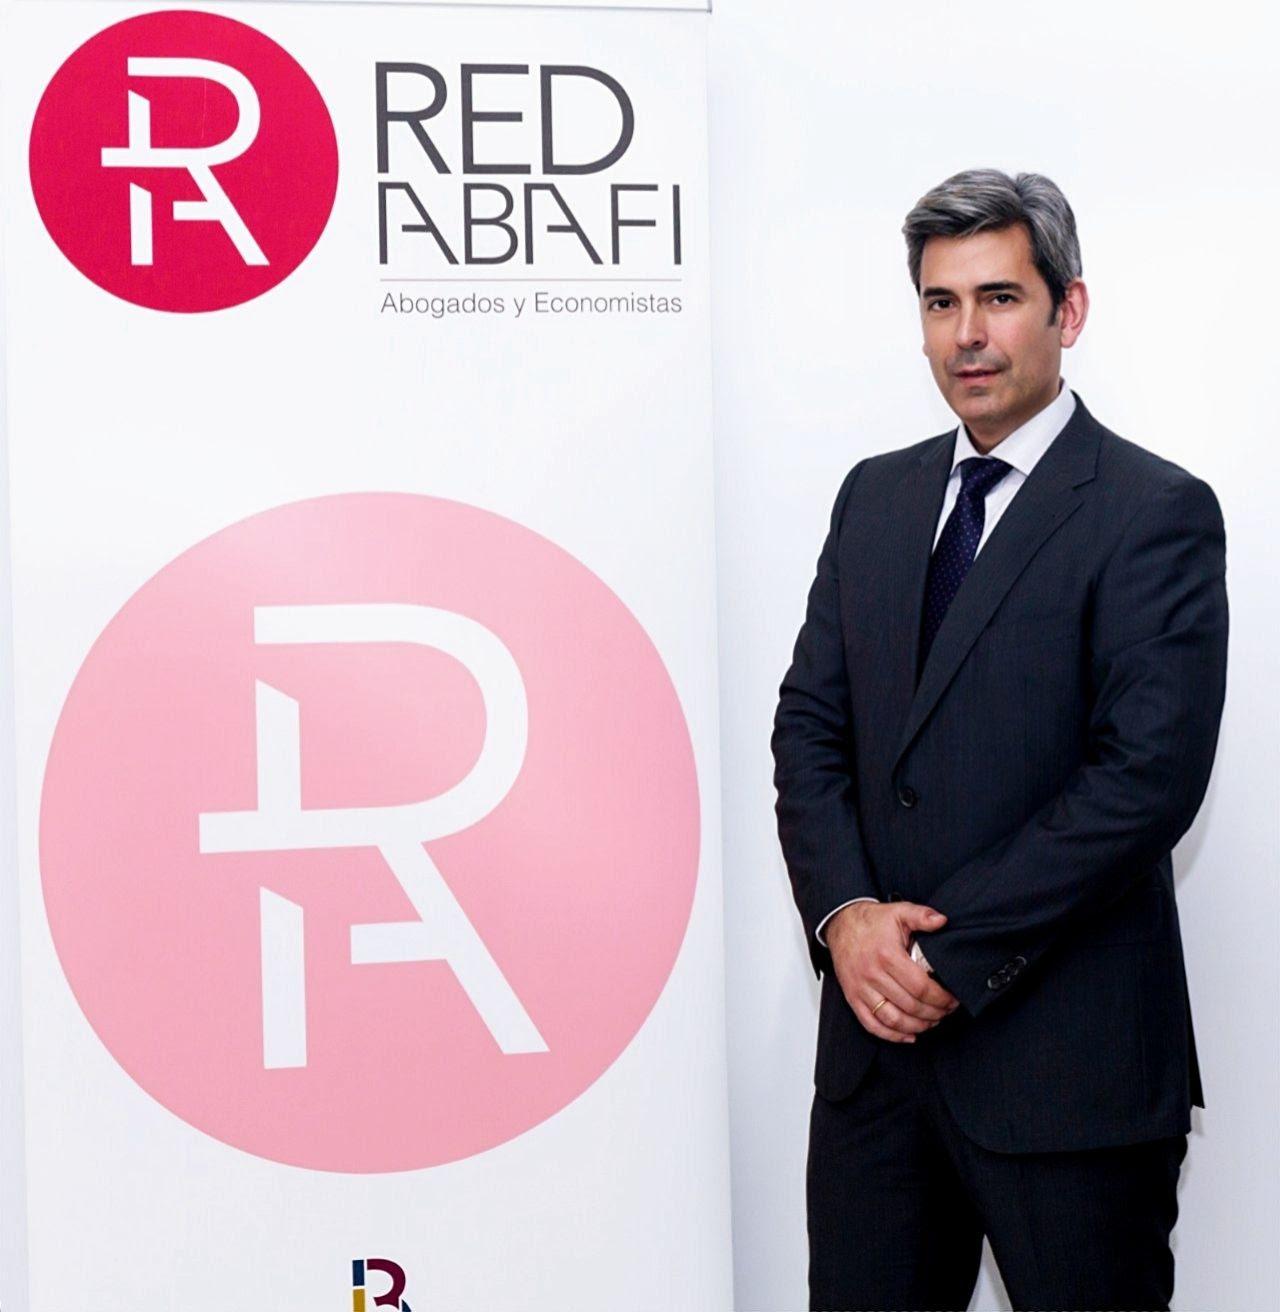 Rafael López, letrado de RED ABAFI en Córdoba